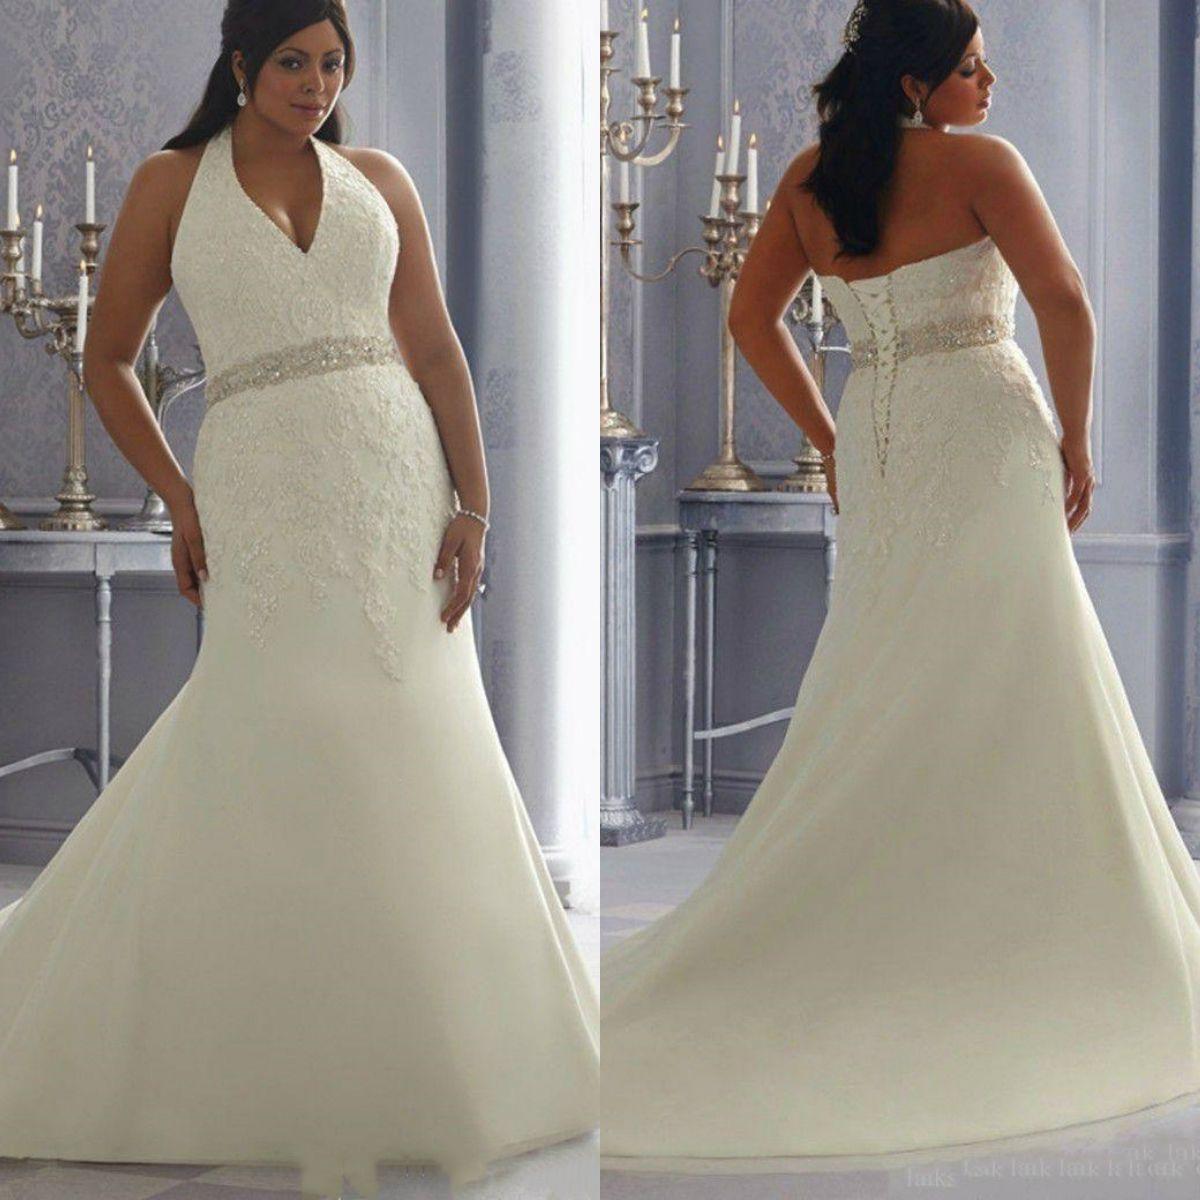 a3d52e357f4 Plus Size Hater Neck Wedding Dress 2019 Mermaid Bridal Gowns Marriage Dress  Vestido De Casamento Robe De Mariage Expensive Wedding Dresses Mermaid  Style ...